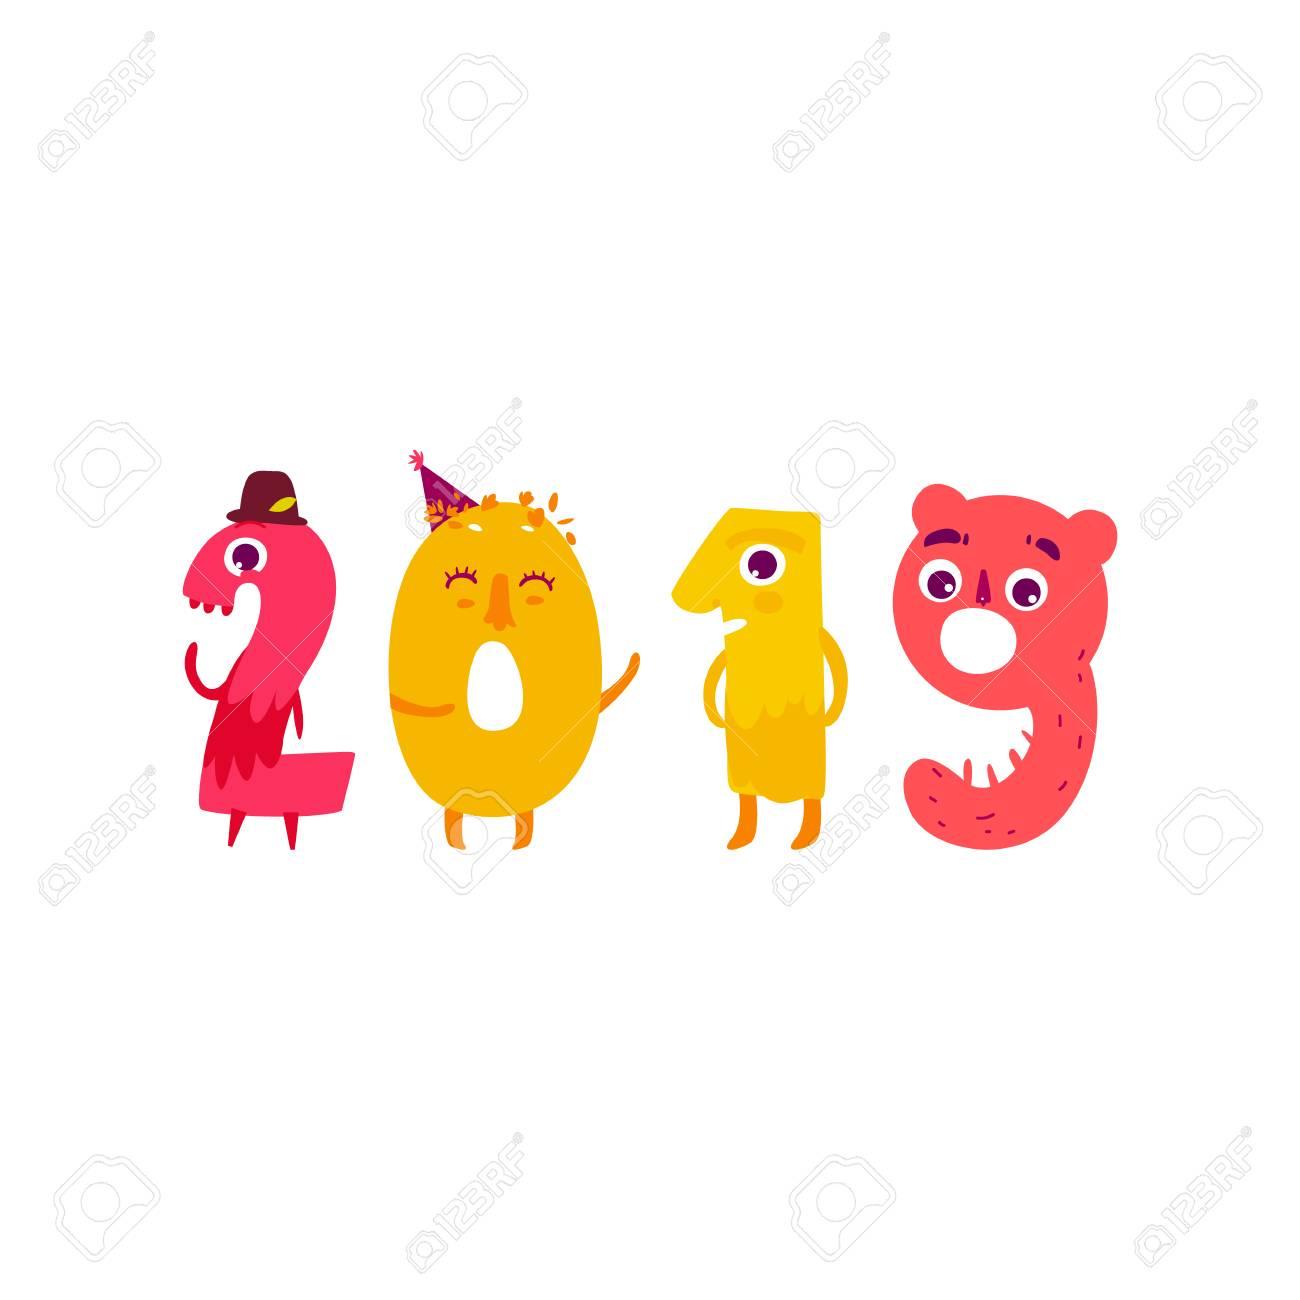 Bien-aimée Vector Cute Animallike Character Number 2019. Illustration De #FG_16